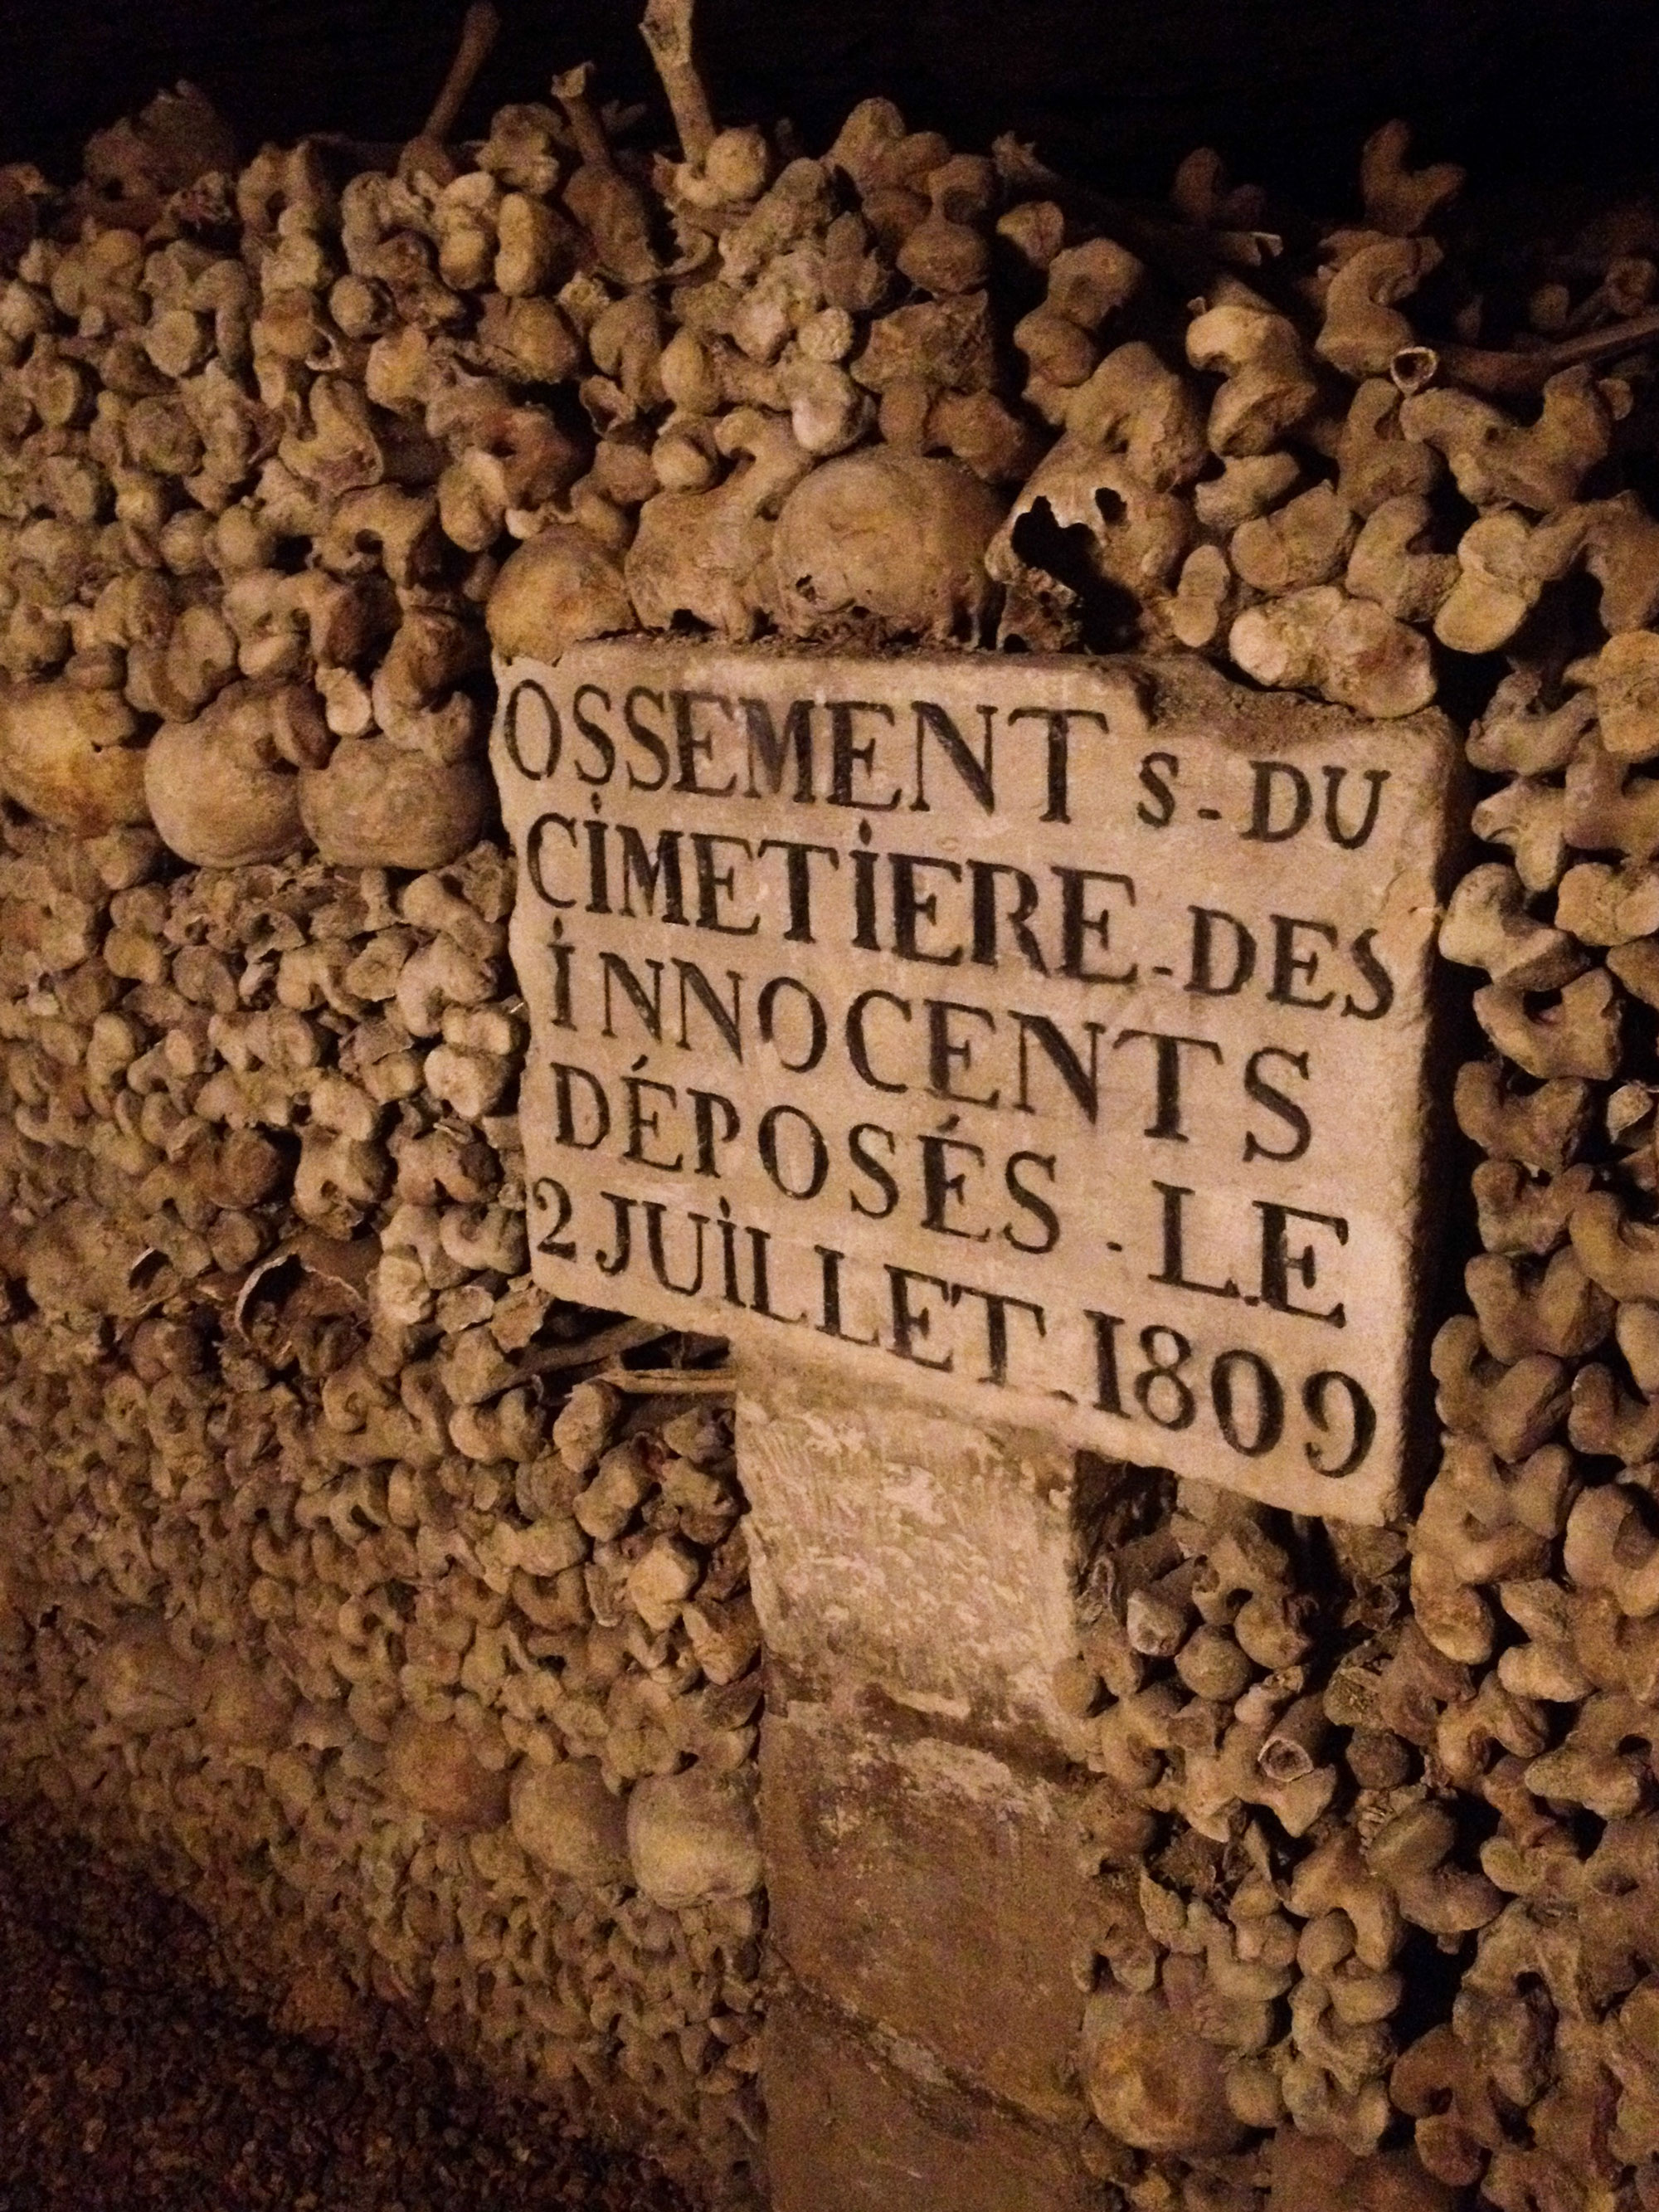 Catacombs, Paris, France, 2015